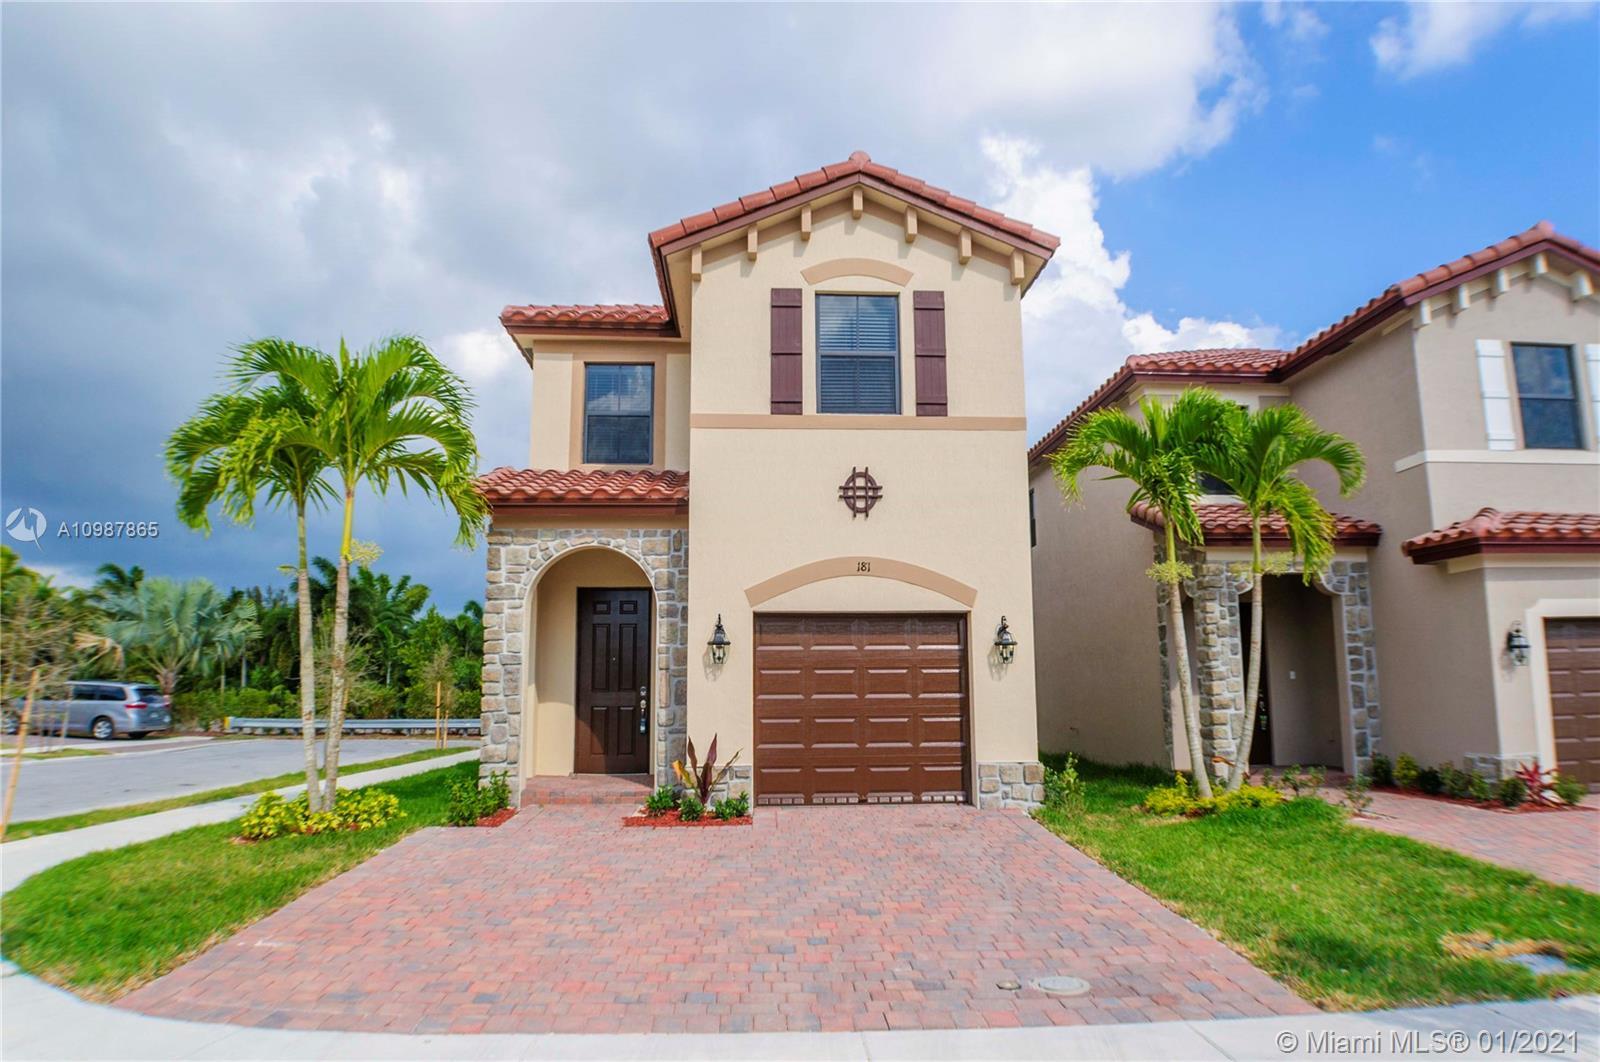 181 NE 37th Pl Property Photo - Homestead, FL real estate listing